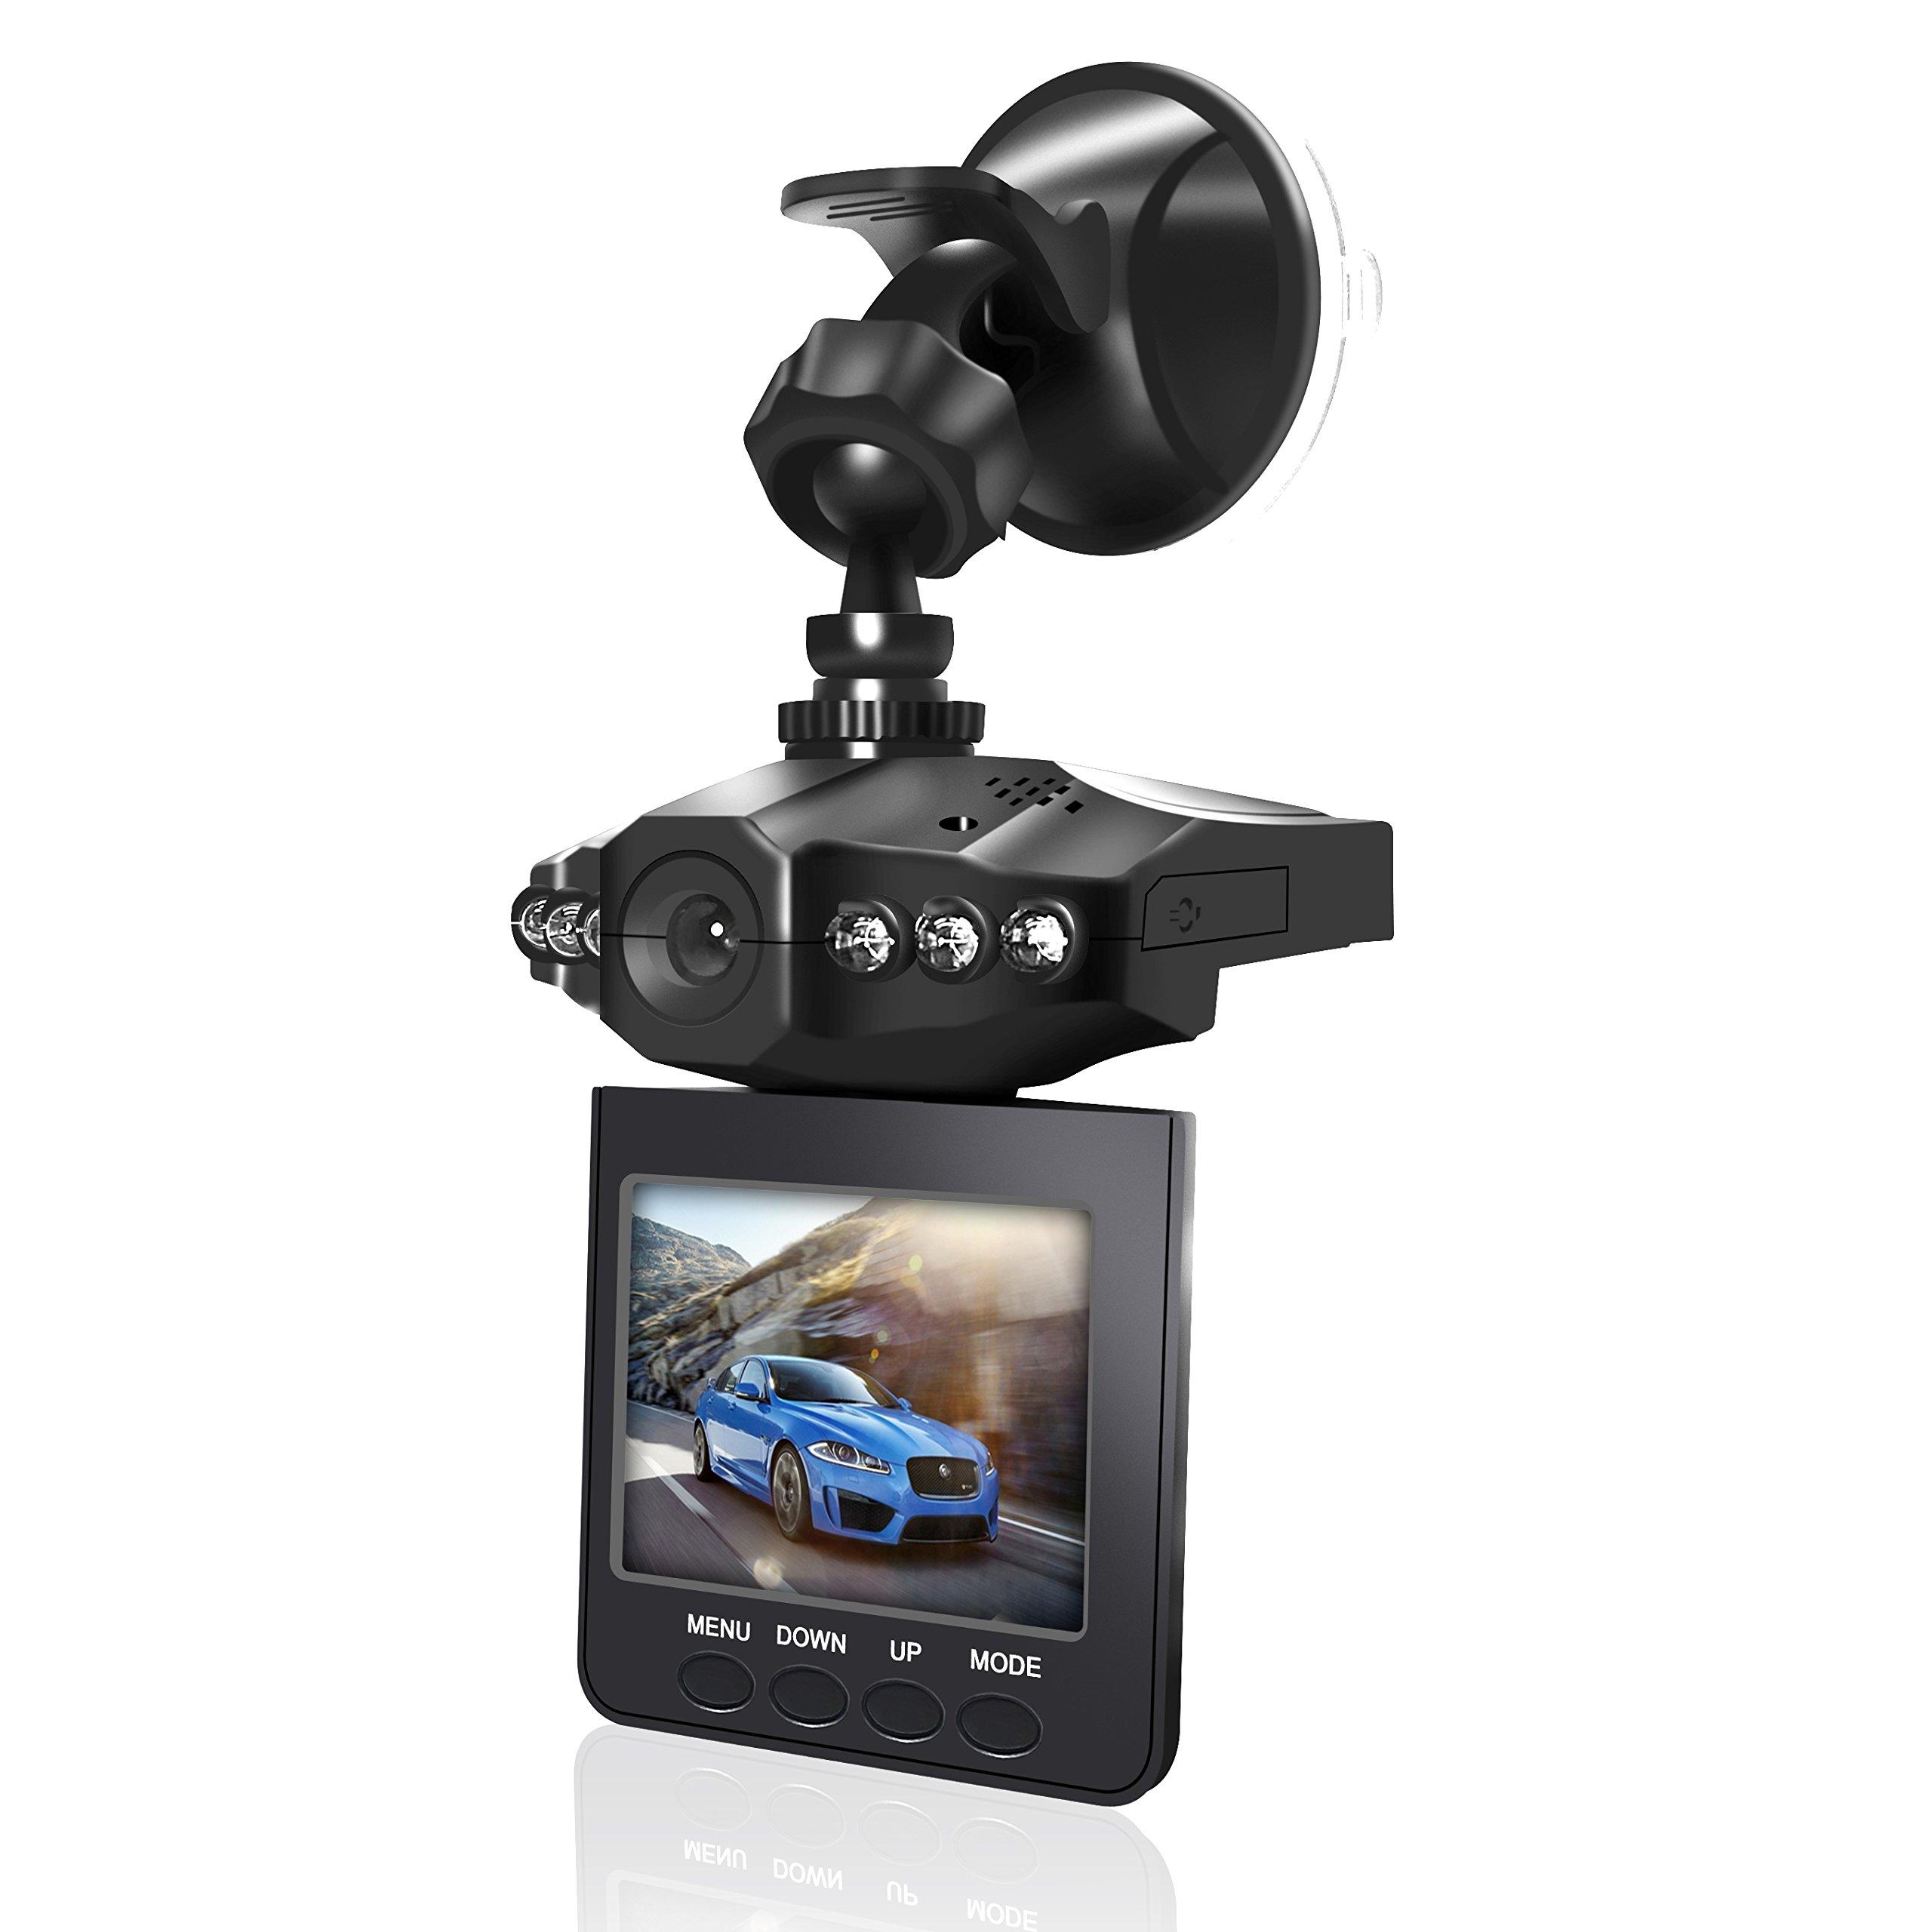 econoLED Dash Cam,Car DVR,Dashboard Camera,Car Recorder 2.5'' for Cars/HD IR Dash Cam 270 Degrees Rotatable Camera Video Recorder/Traffic Dashboard Camcorder Loop Recording-No Card